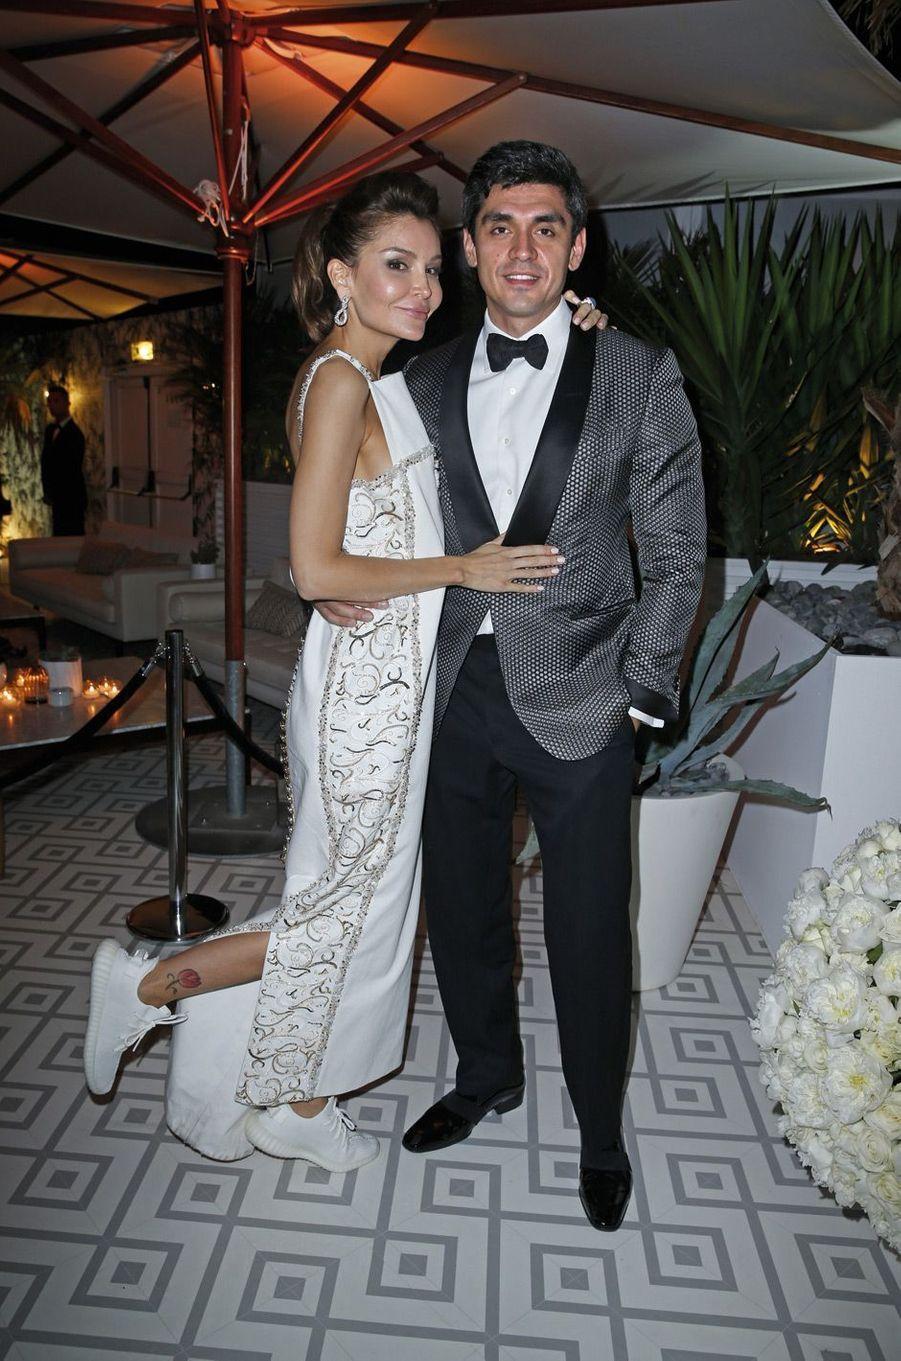 Lola Karmova-Tillyaeva et son mari, Timur Tillyaev.